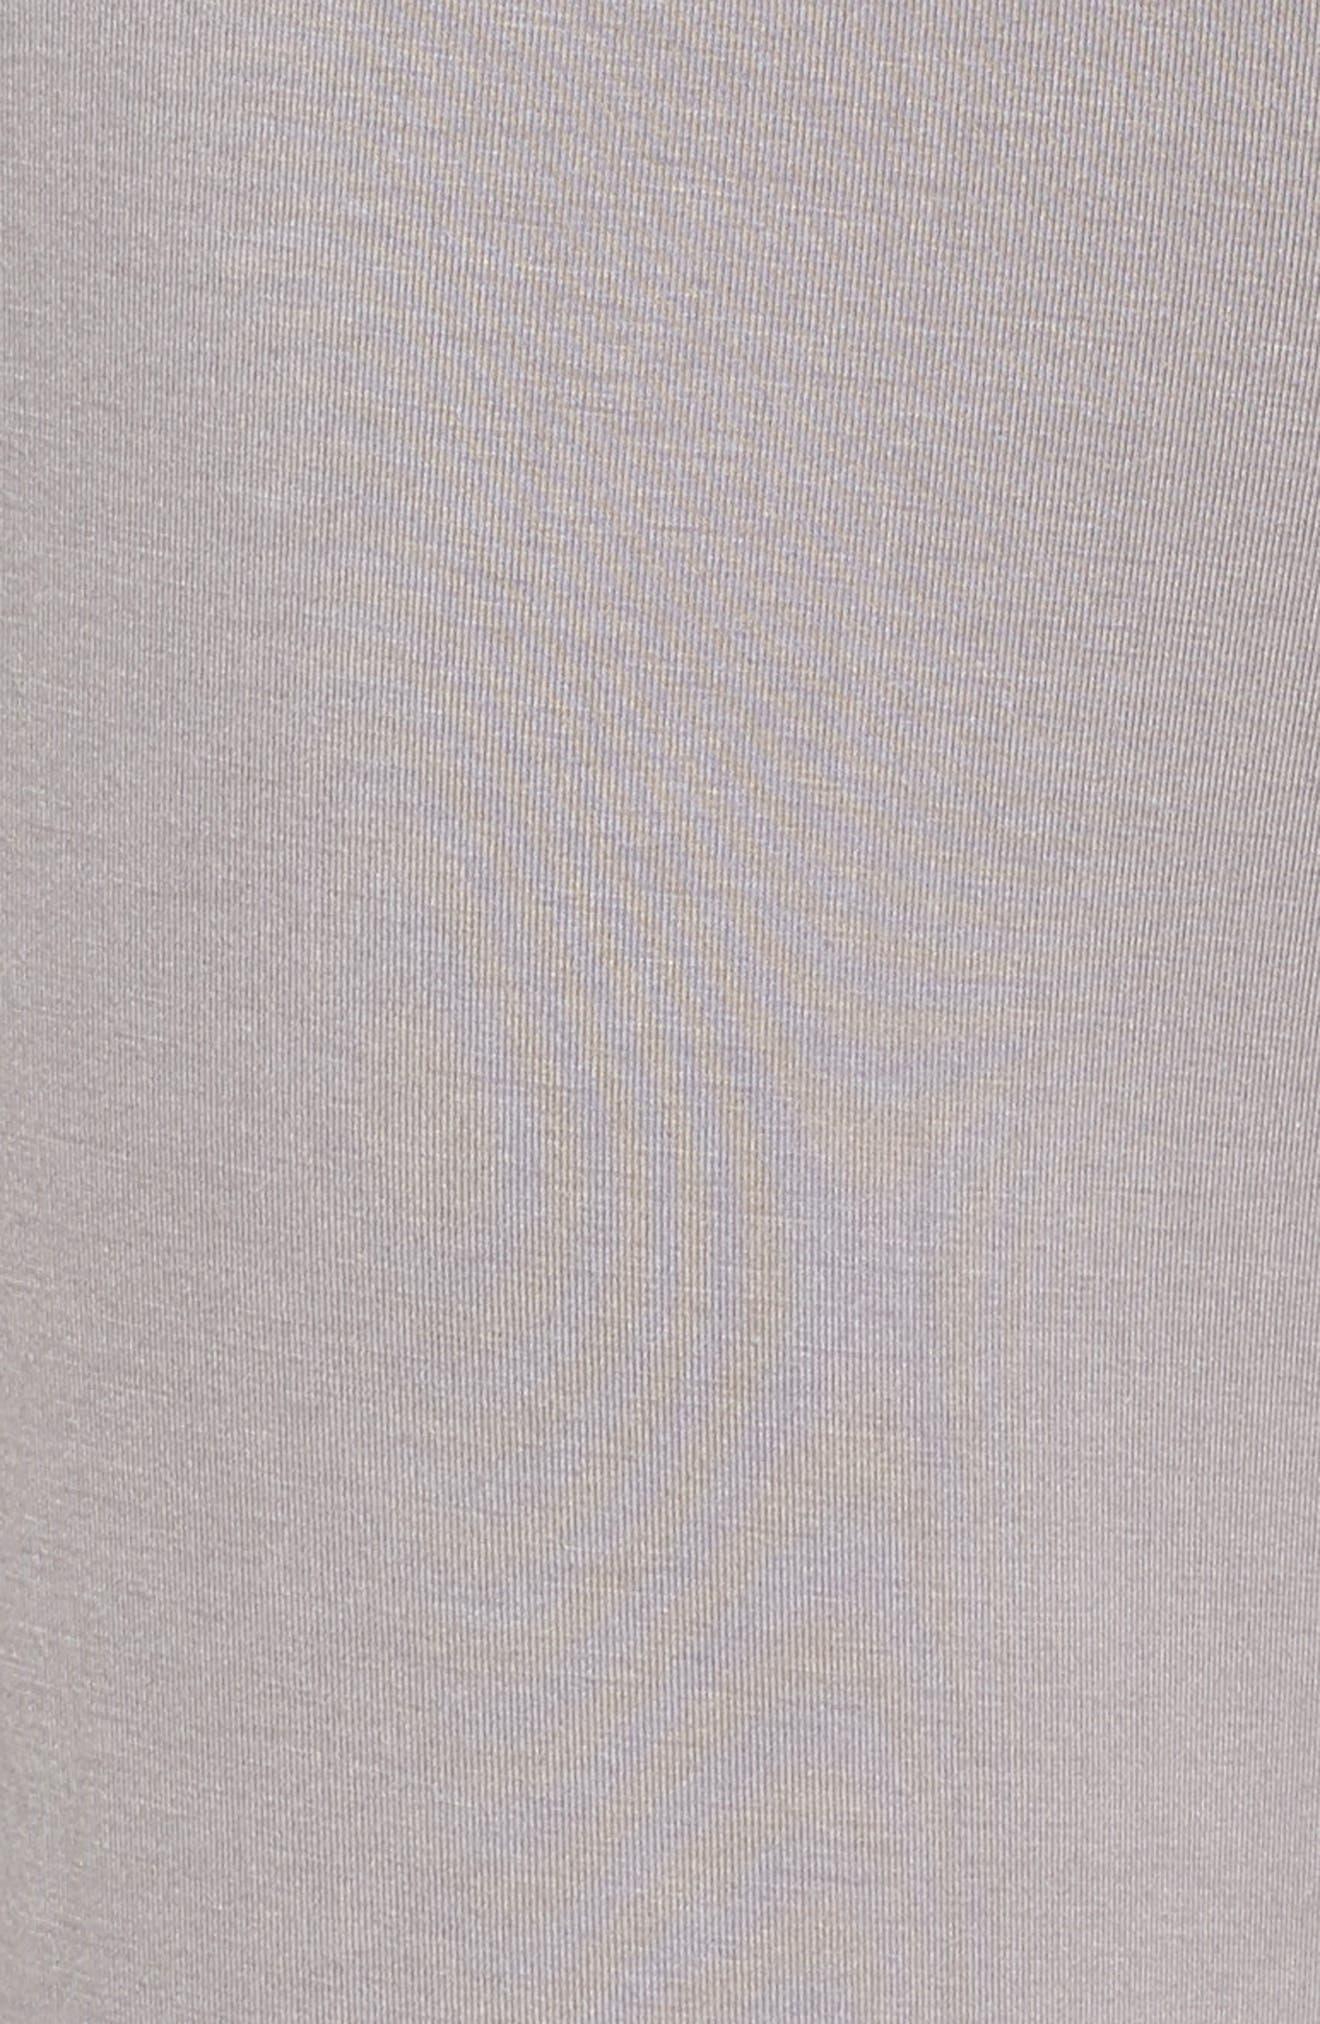 NORDSTROM LINGERIE,                             Breathe Stretch Modal Pants,                             Alternate thumbnail 5, color,                             GREY GULL